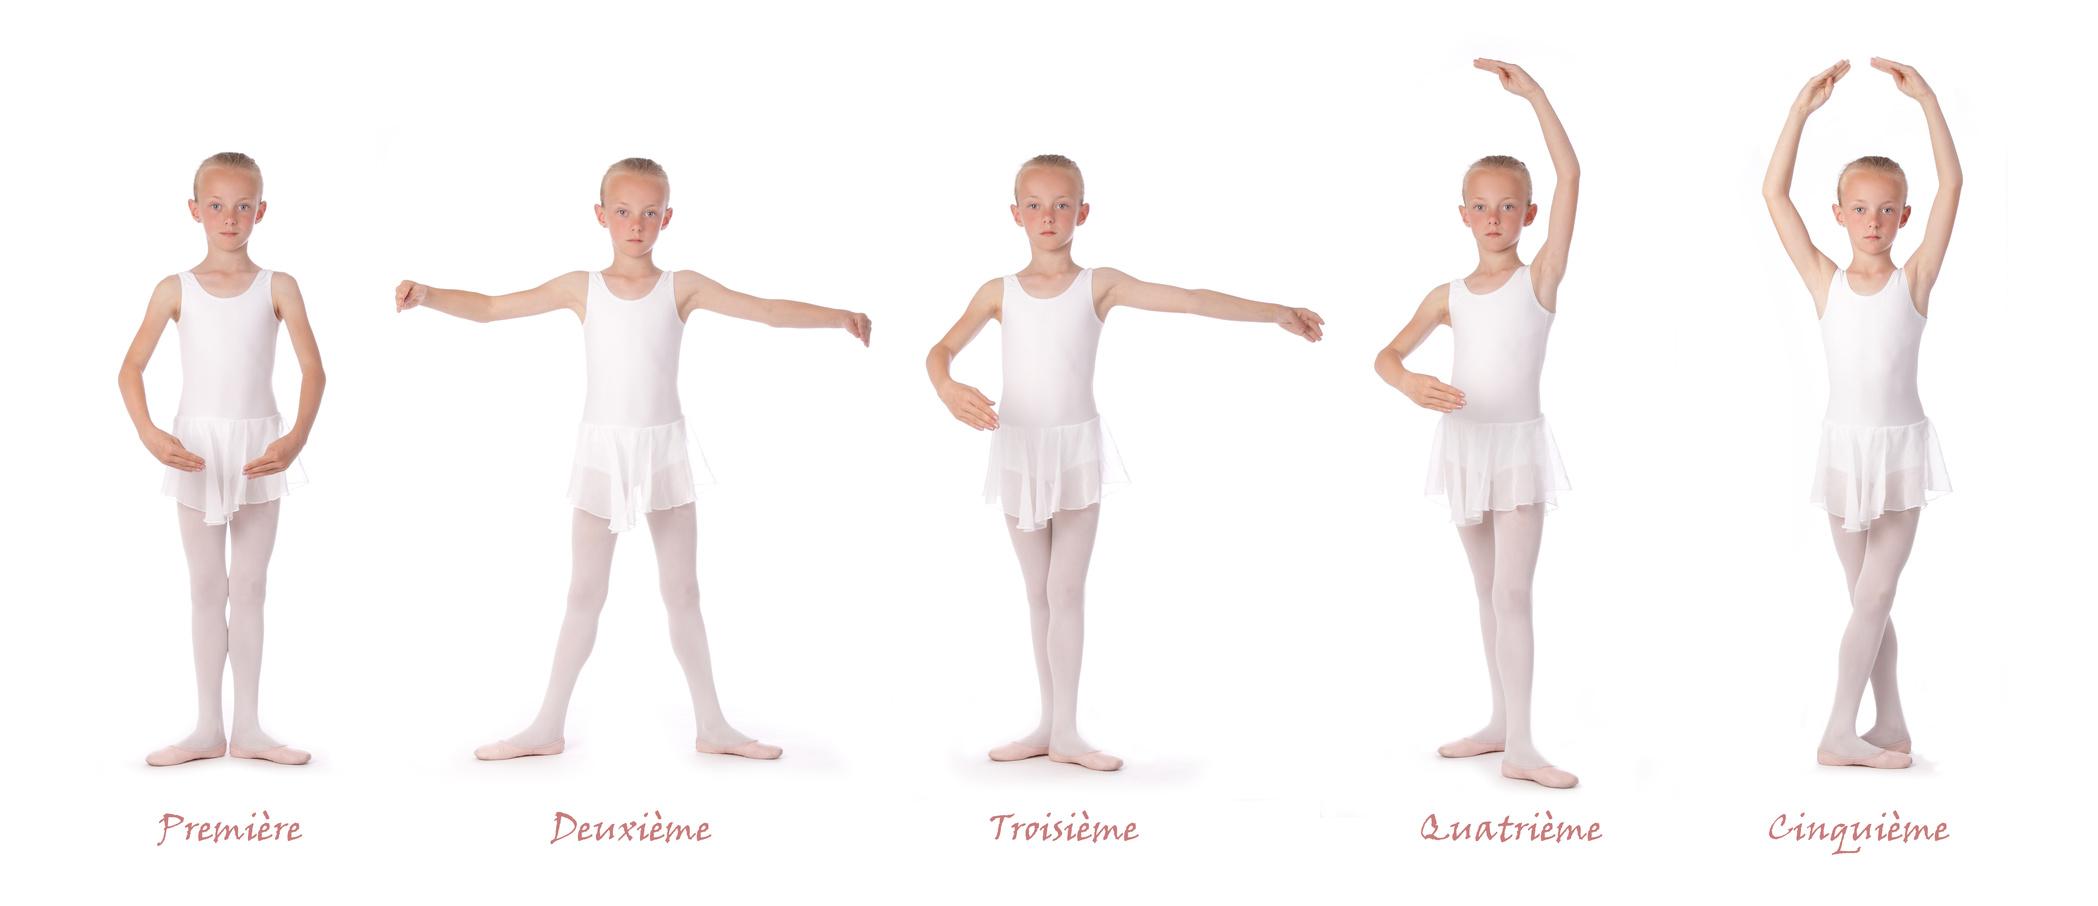 позиции в балете названия с картинками